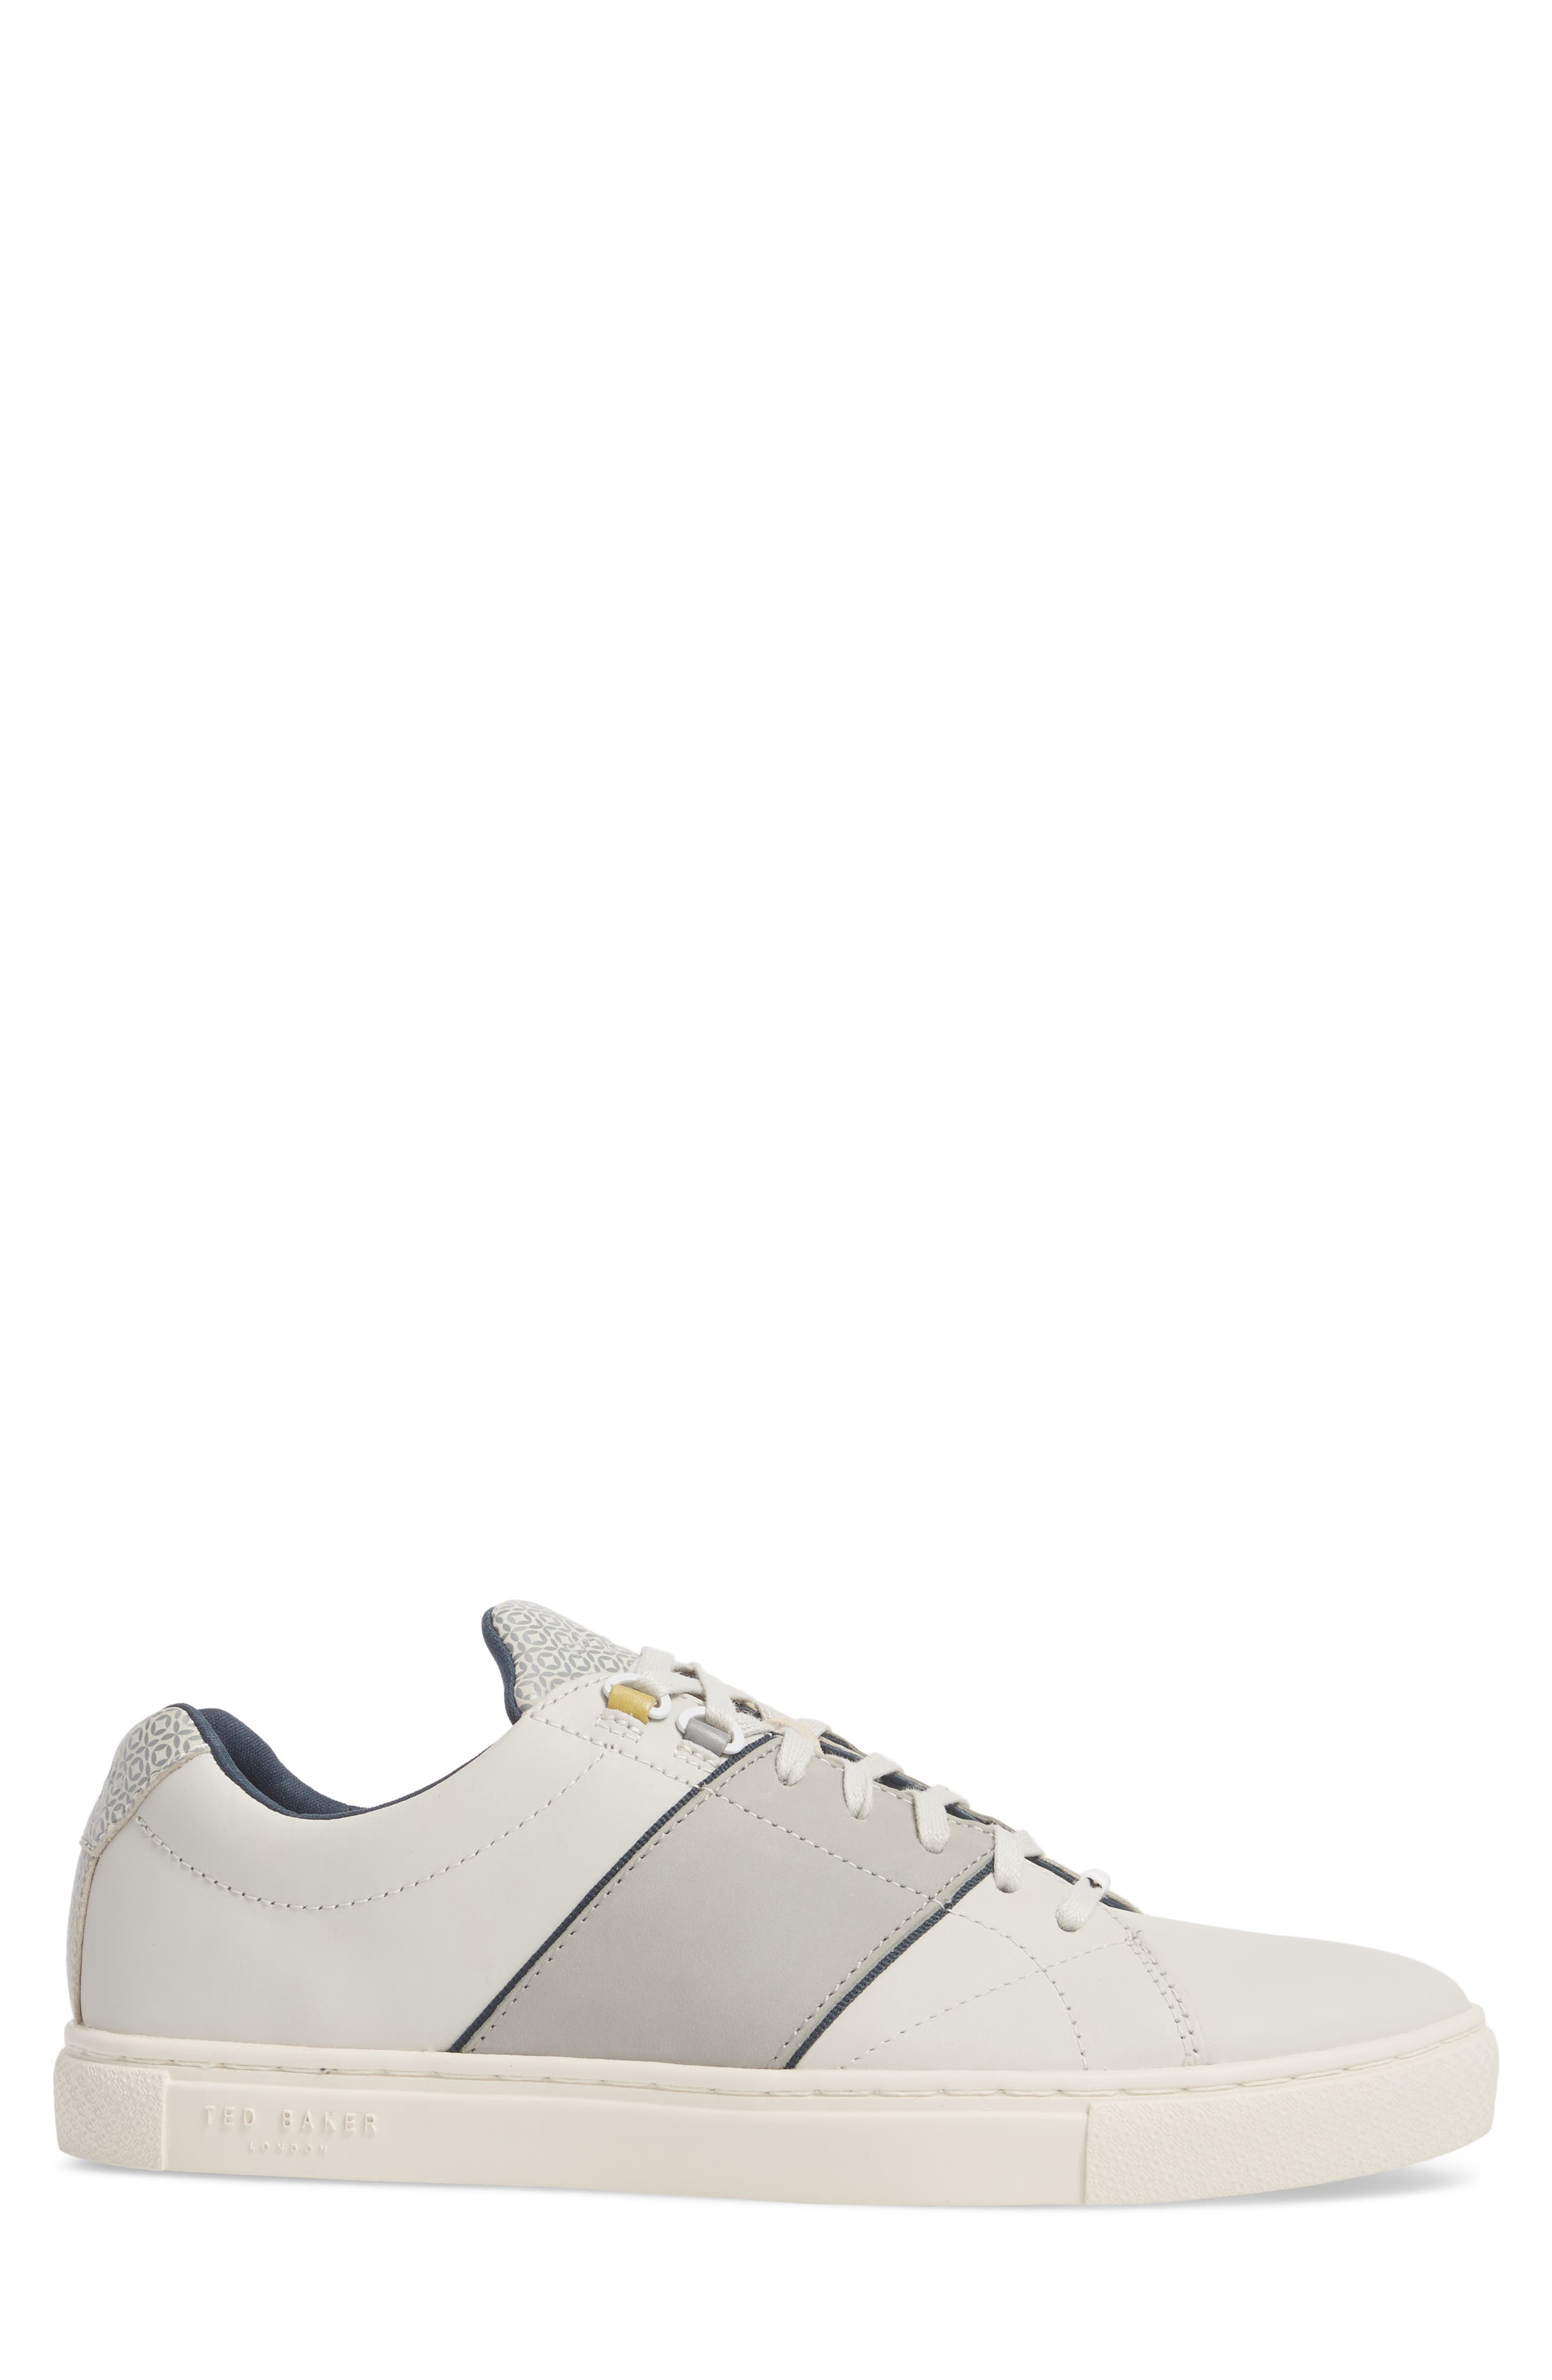 Ted Baker Quana Low Top Sneaker,                             Alternate thumbnail 3, color,                             152